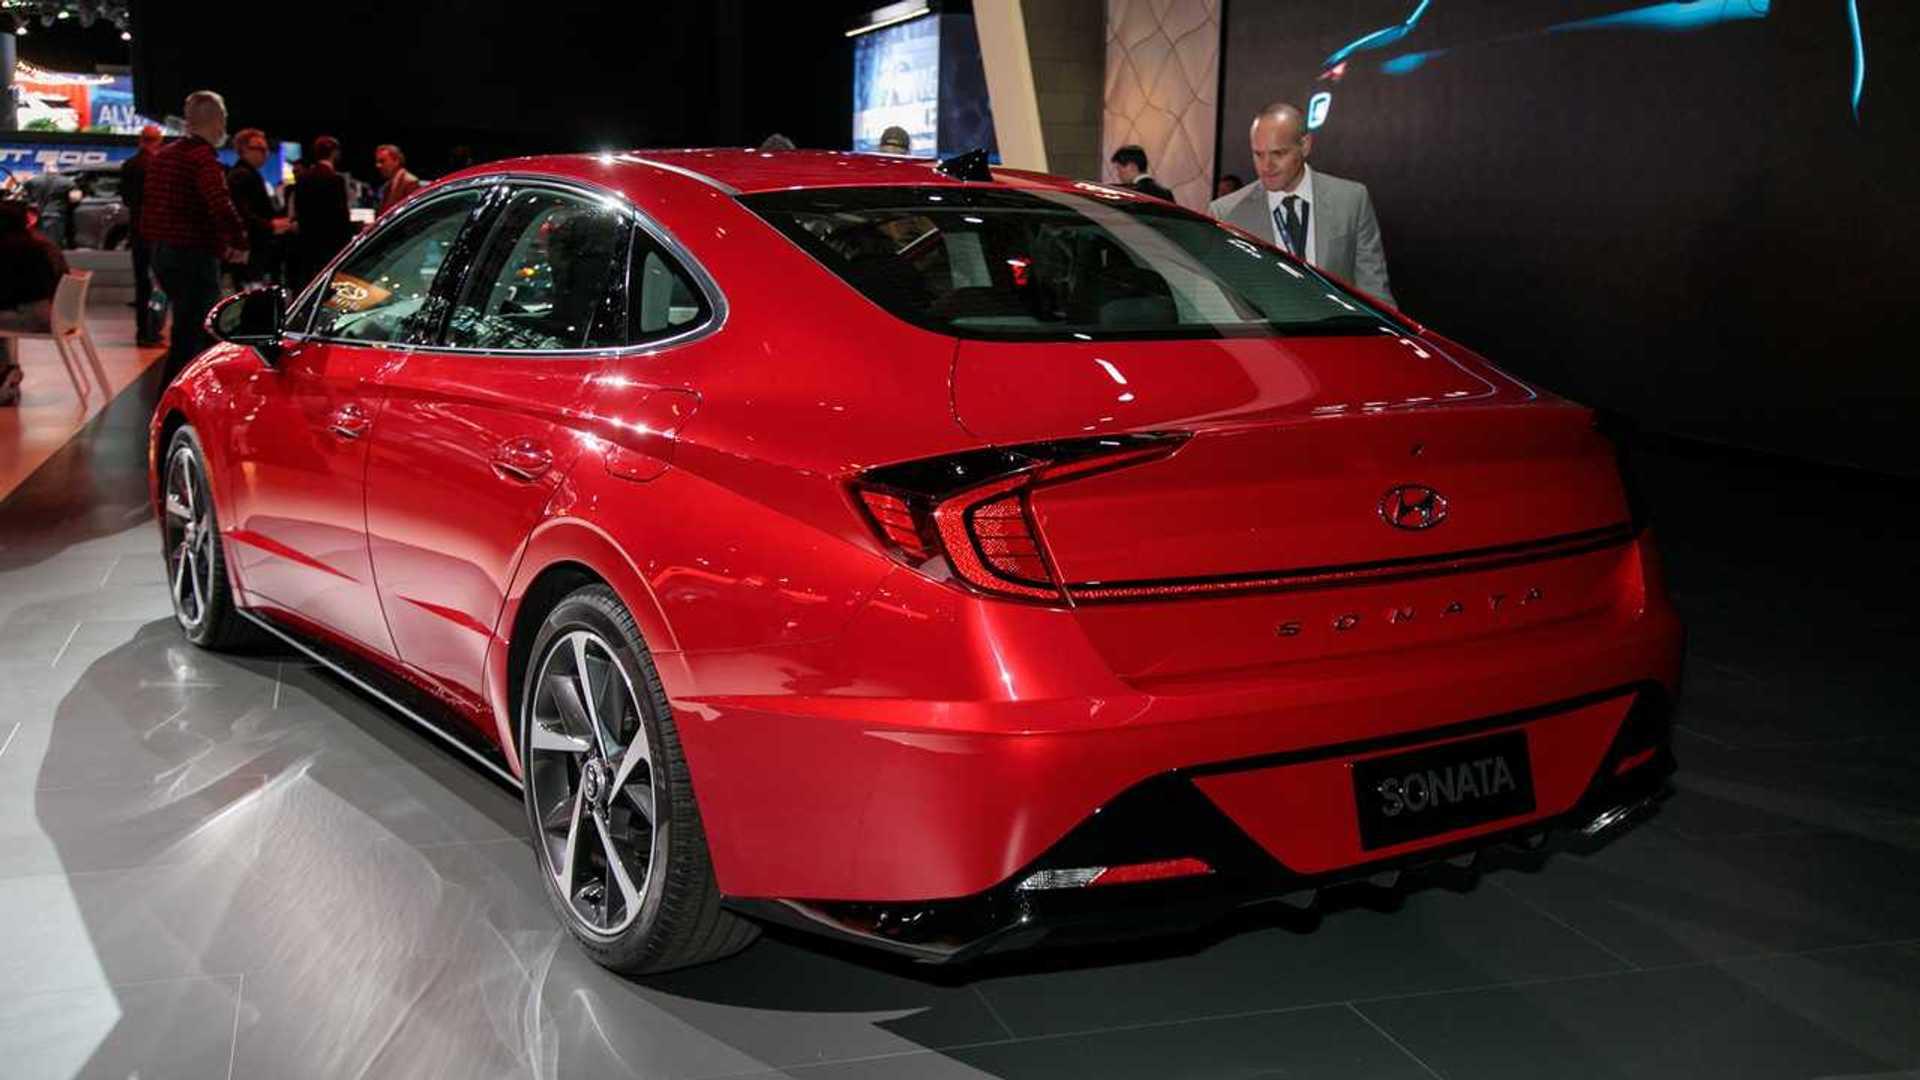 Hyundai Sonata N Line Planned With More Than 275 Horsepower